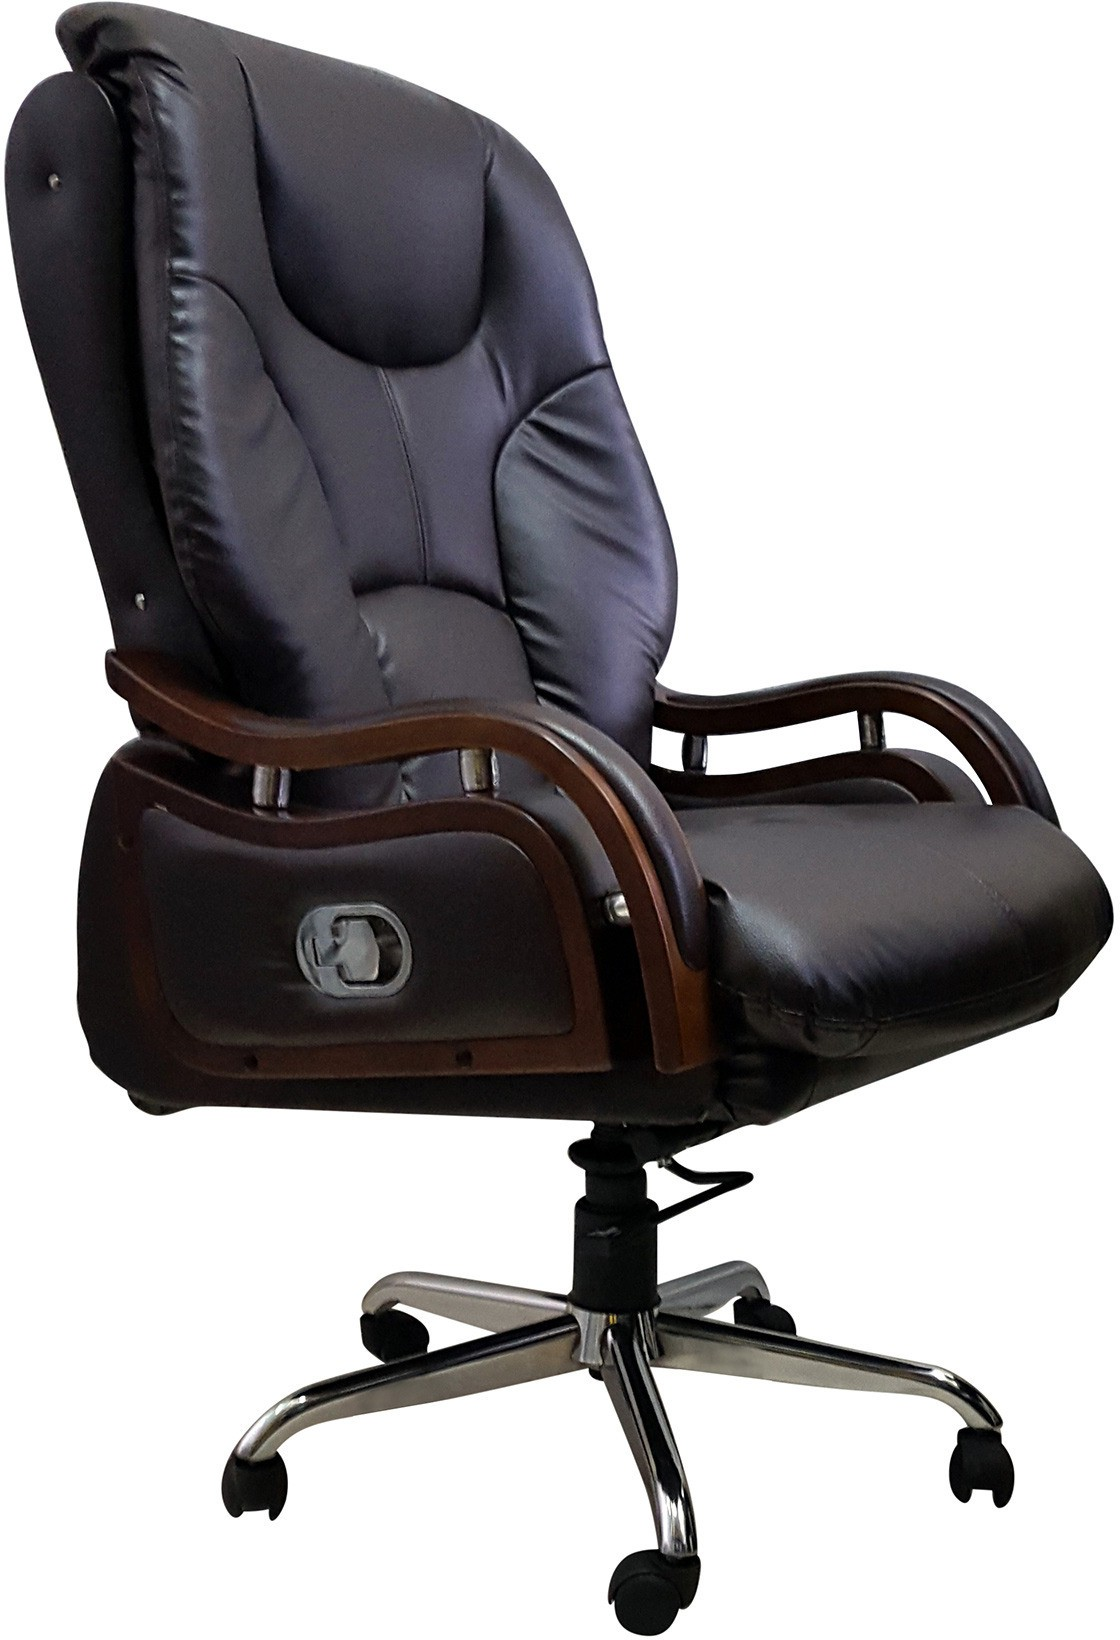 DIVANO Leatherette Office Chair class=